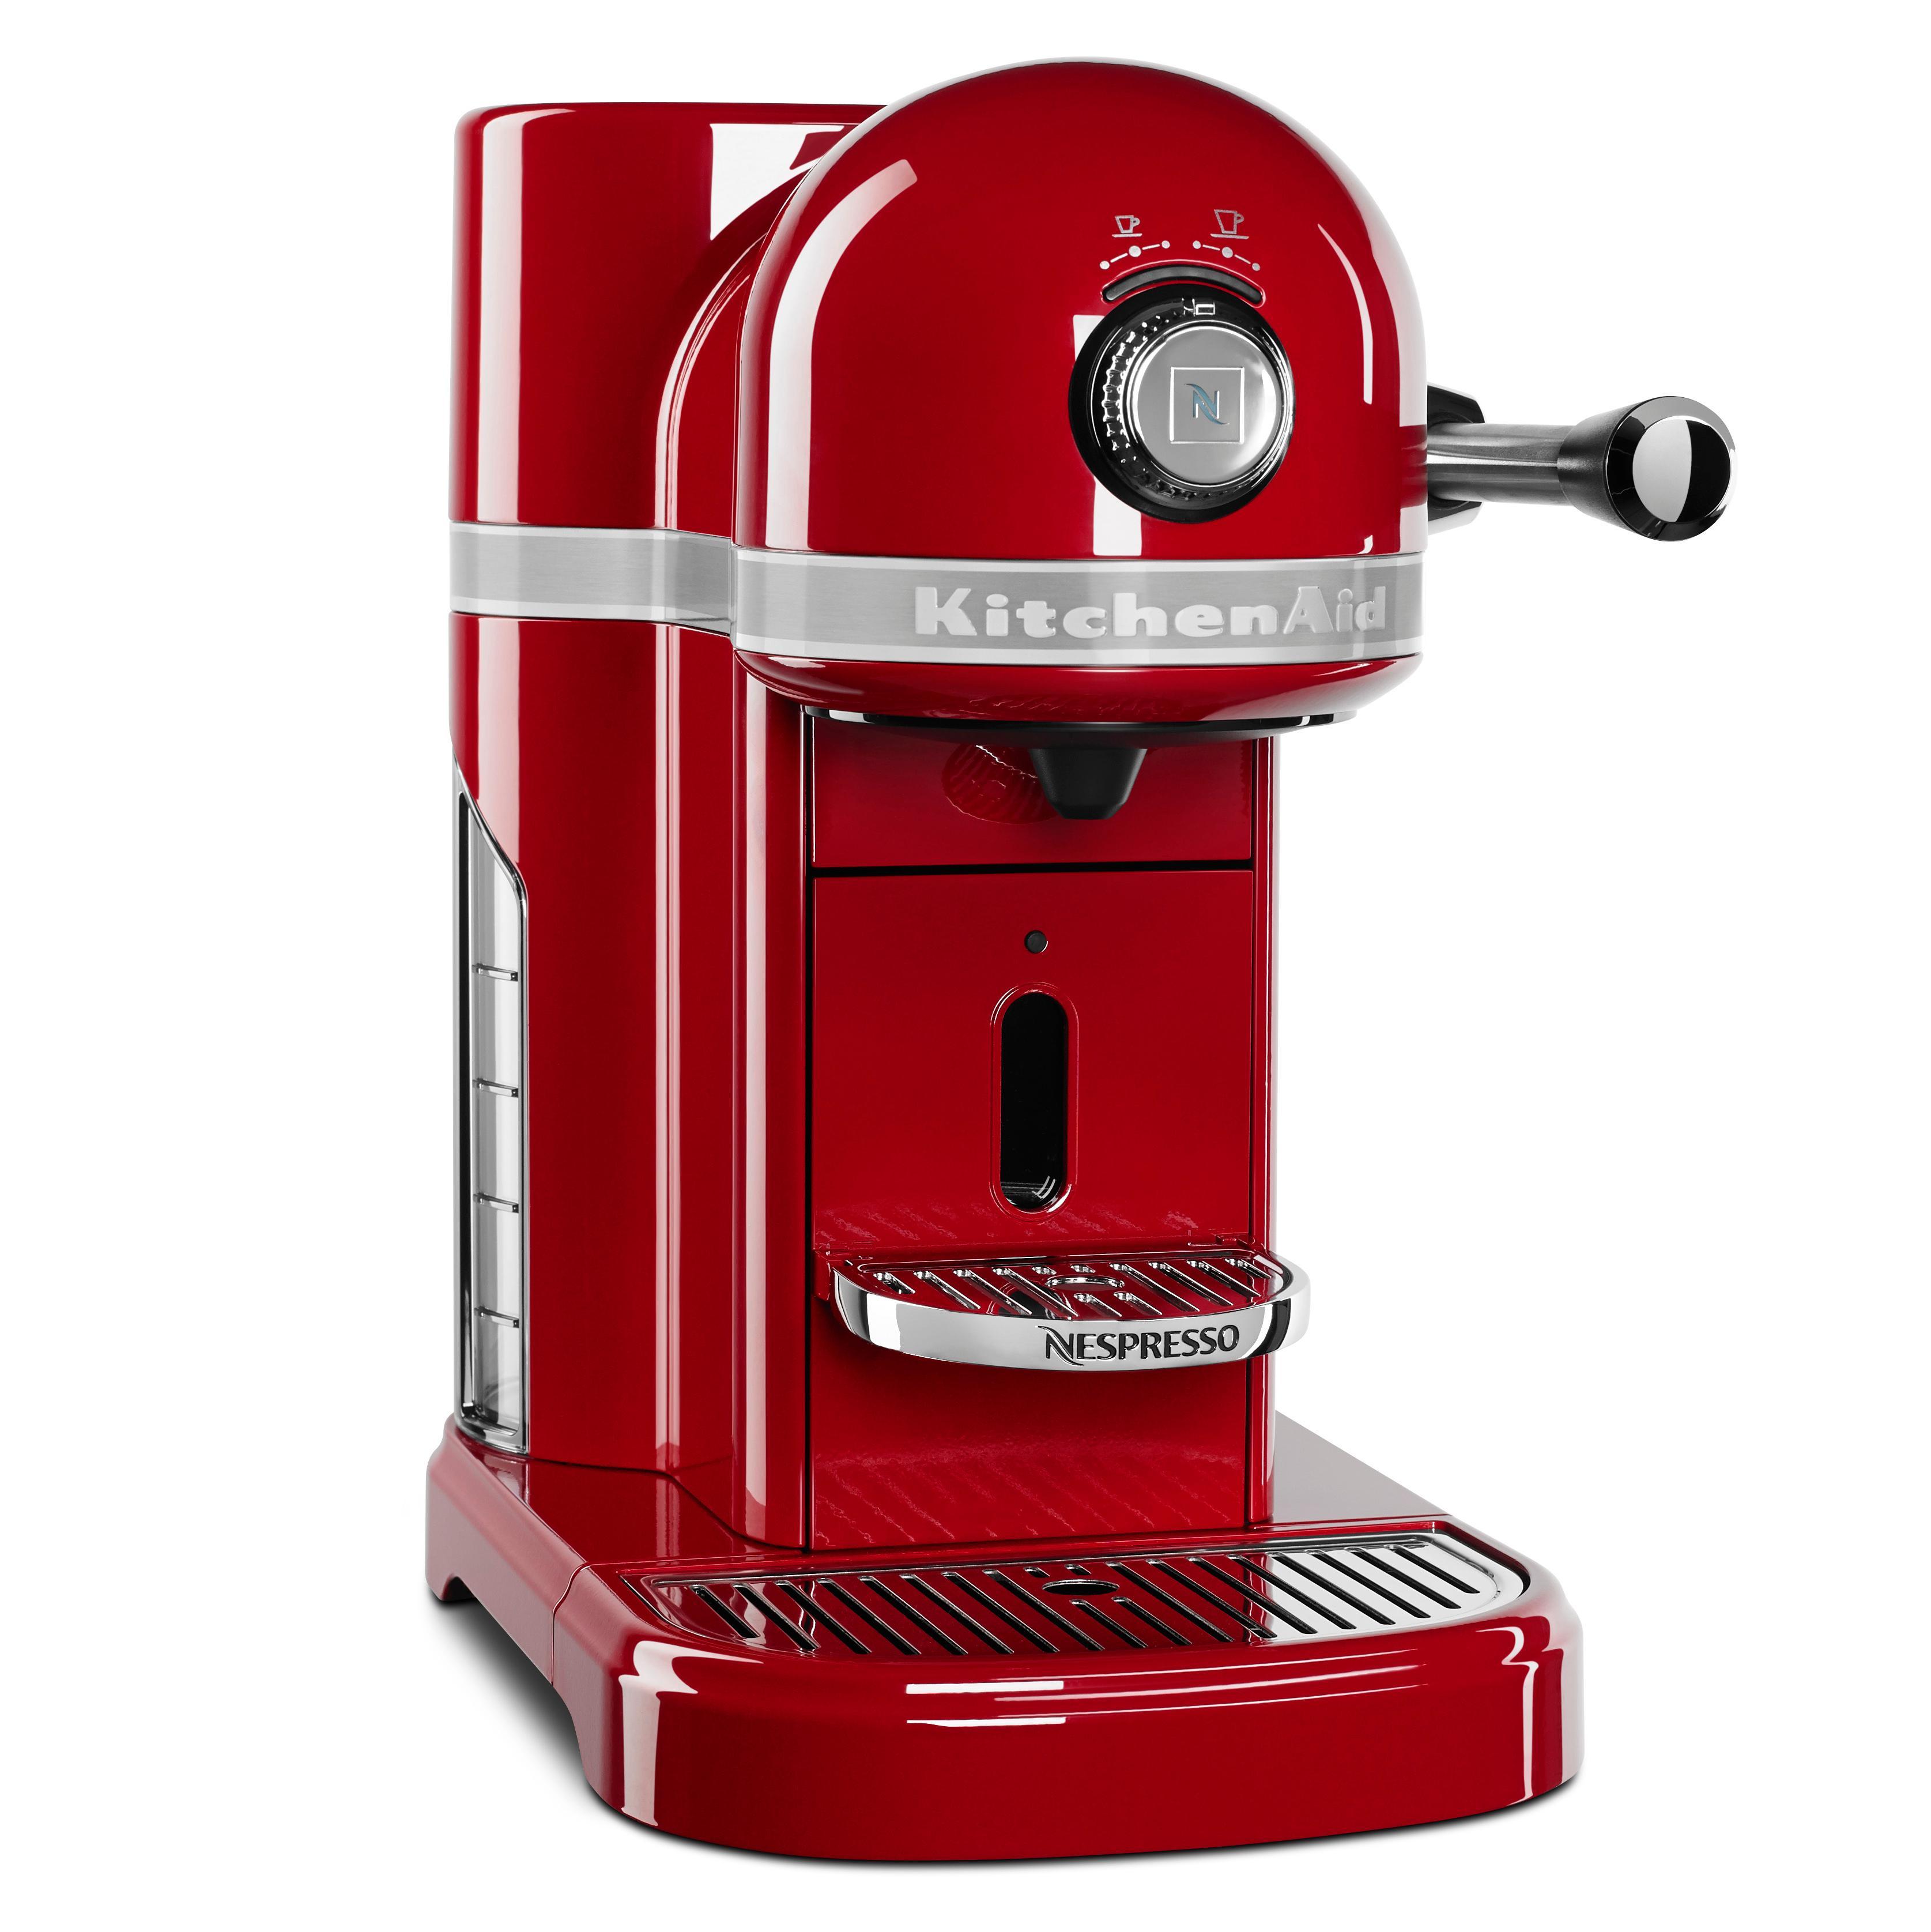 Amazon.com: KitchenAid KES0504OB Nespresso Bundle, Onyx